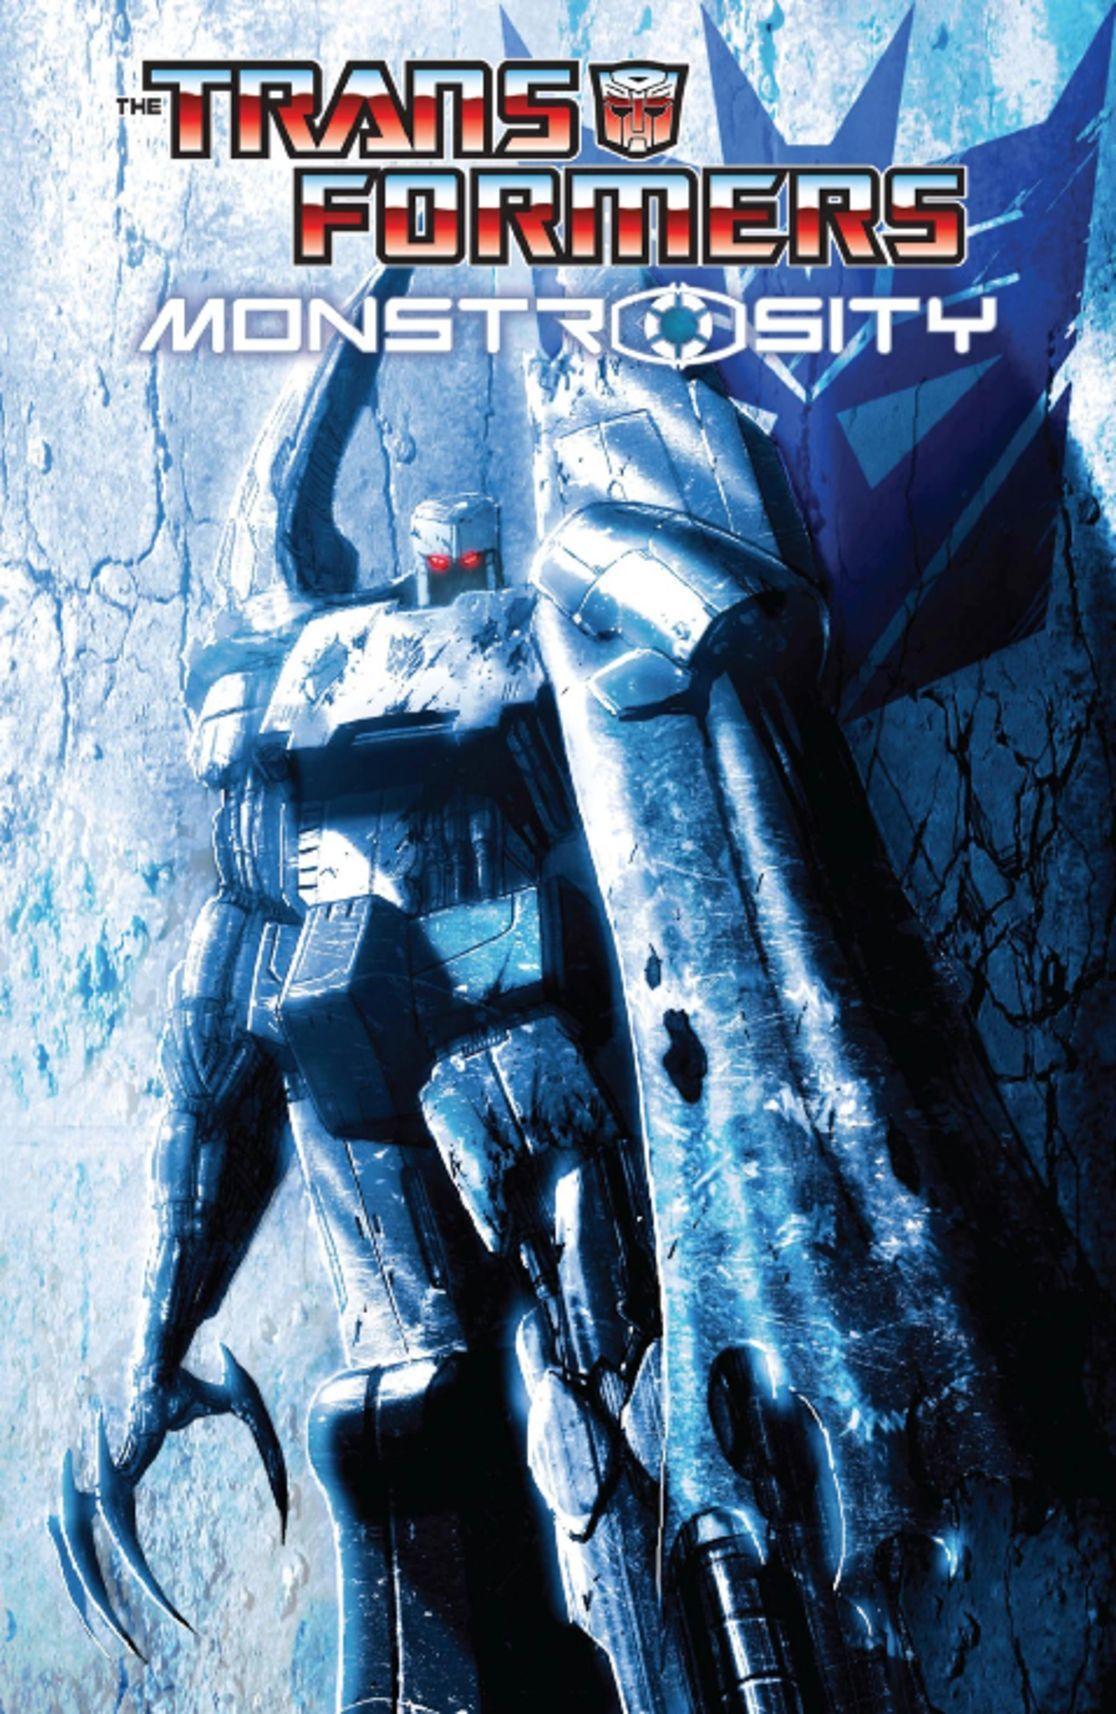 Transformers Monstrosity Digital